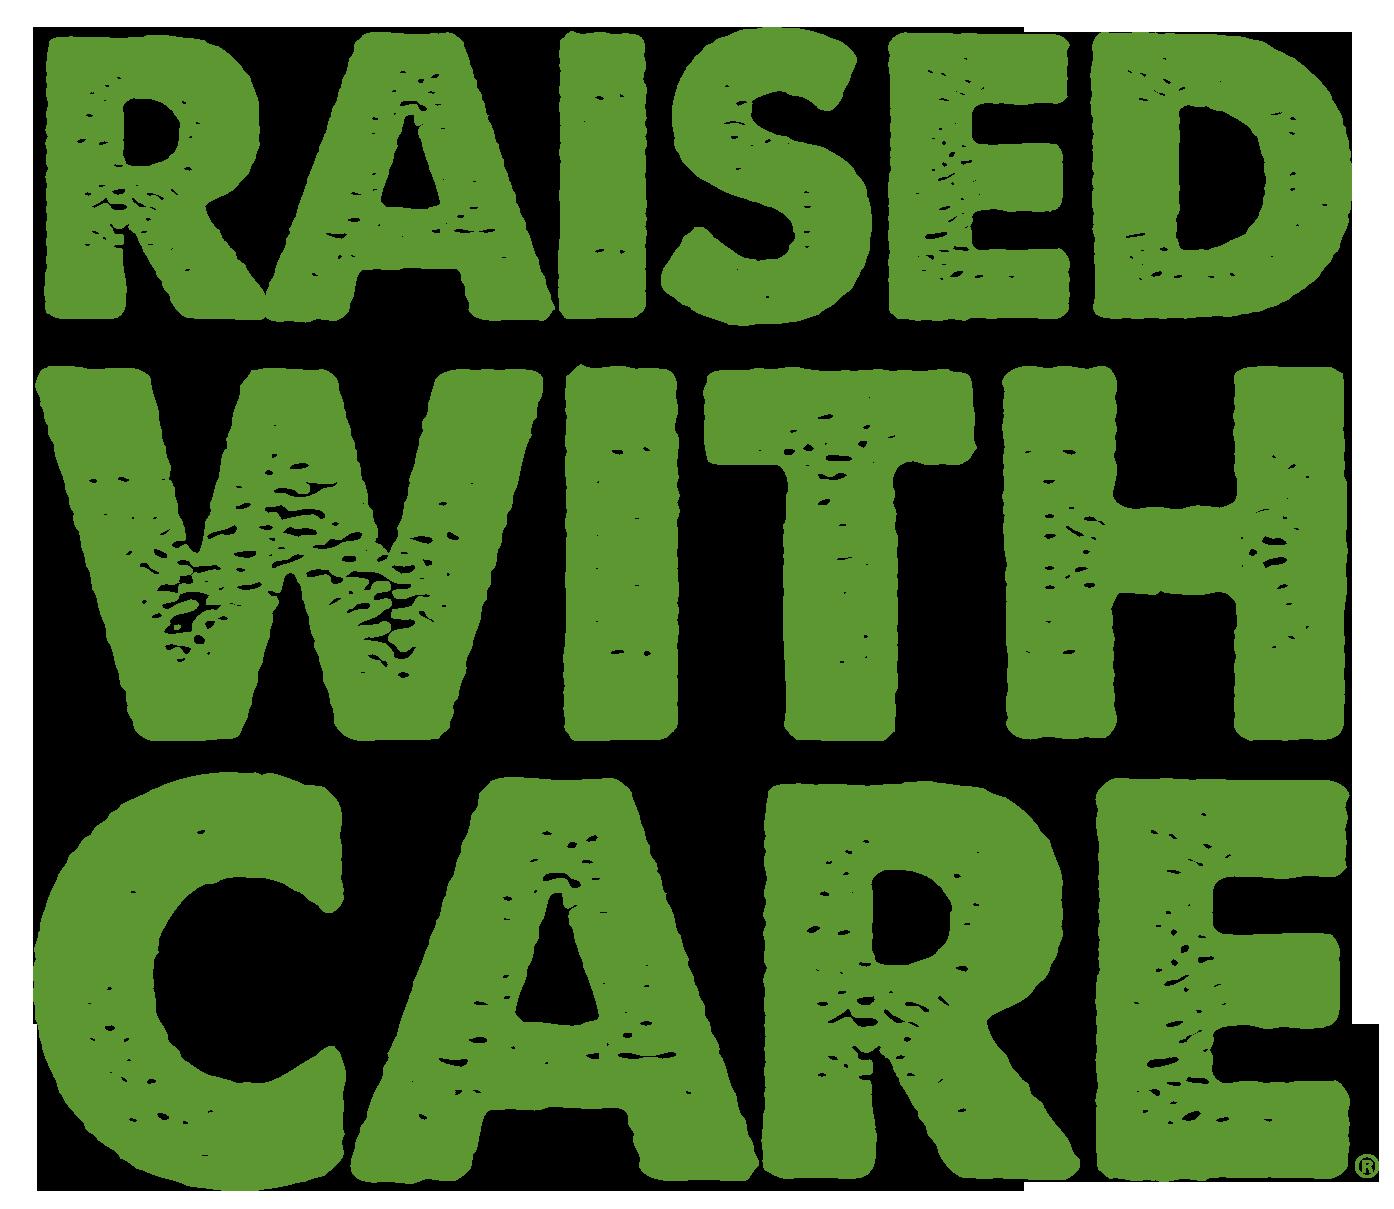 raisedwithcare_green